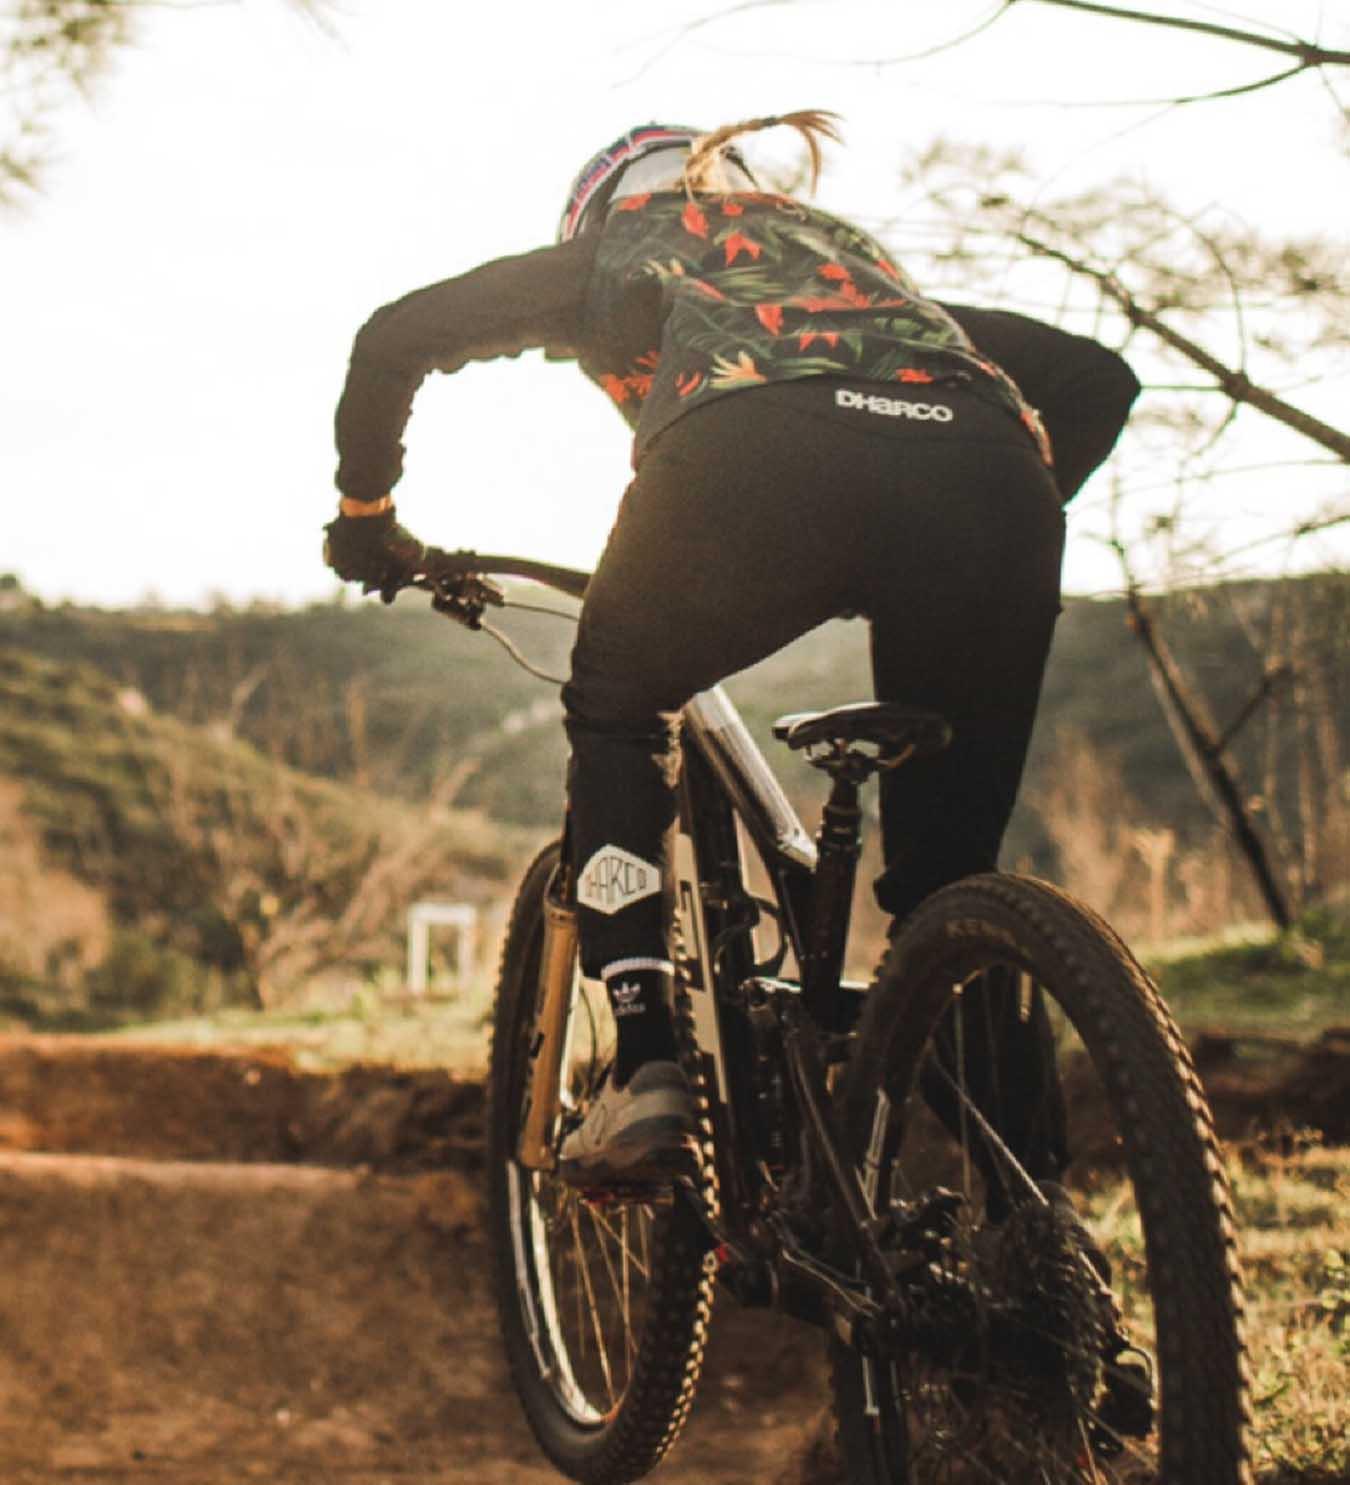 dharco womens mountain bike pants